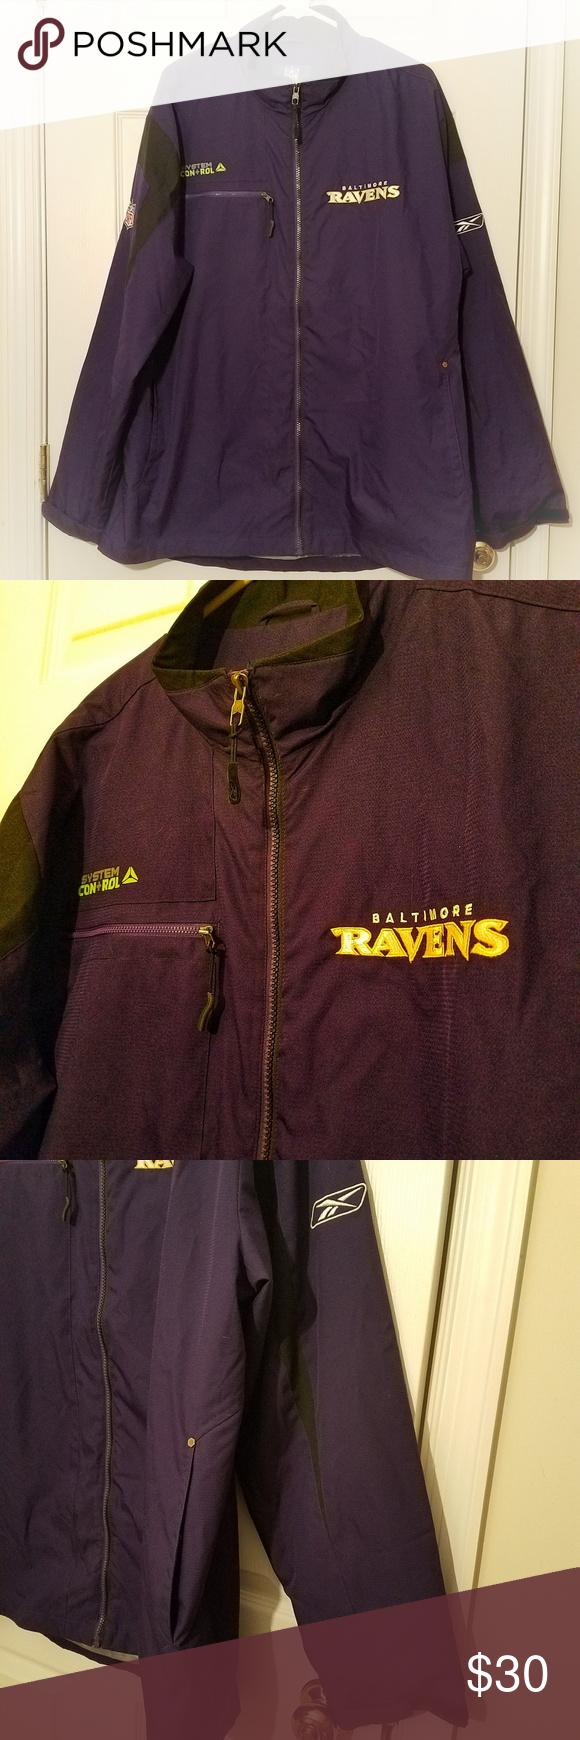 Reebok Sideline Baltimore Ravens Men S Jacket Jackets Clothes Design Mens Jackets [ 1740 x 580 Pixel ]